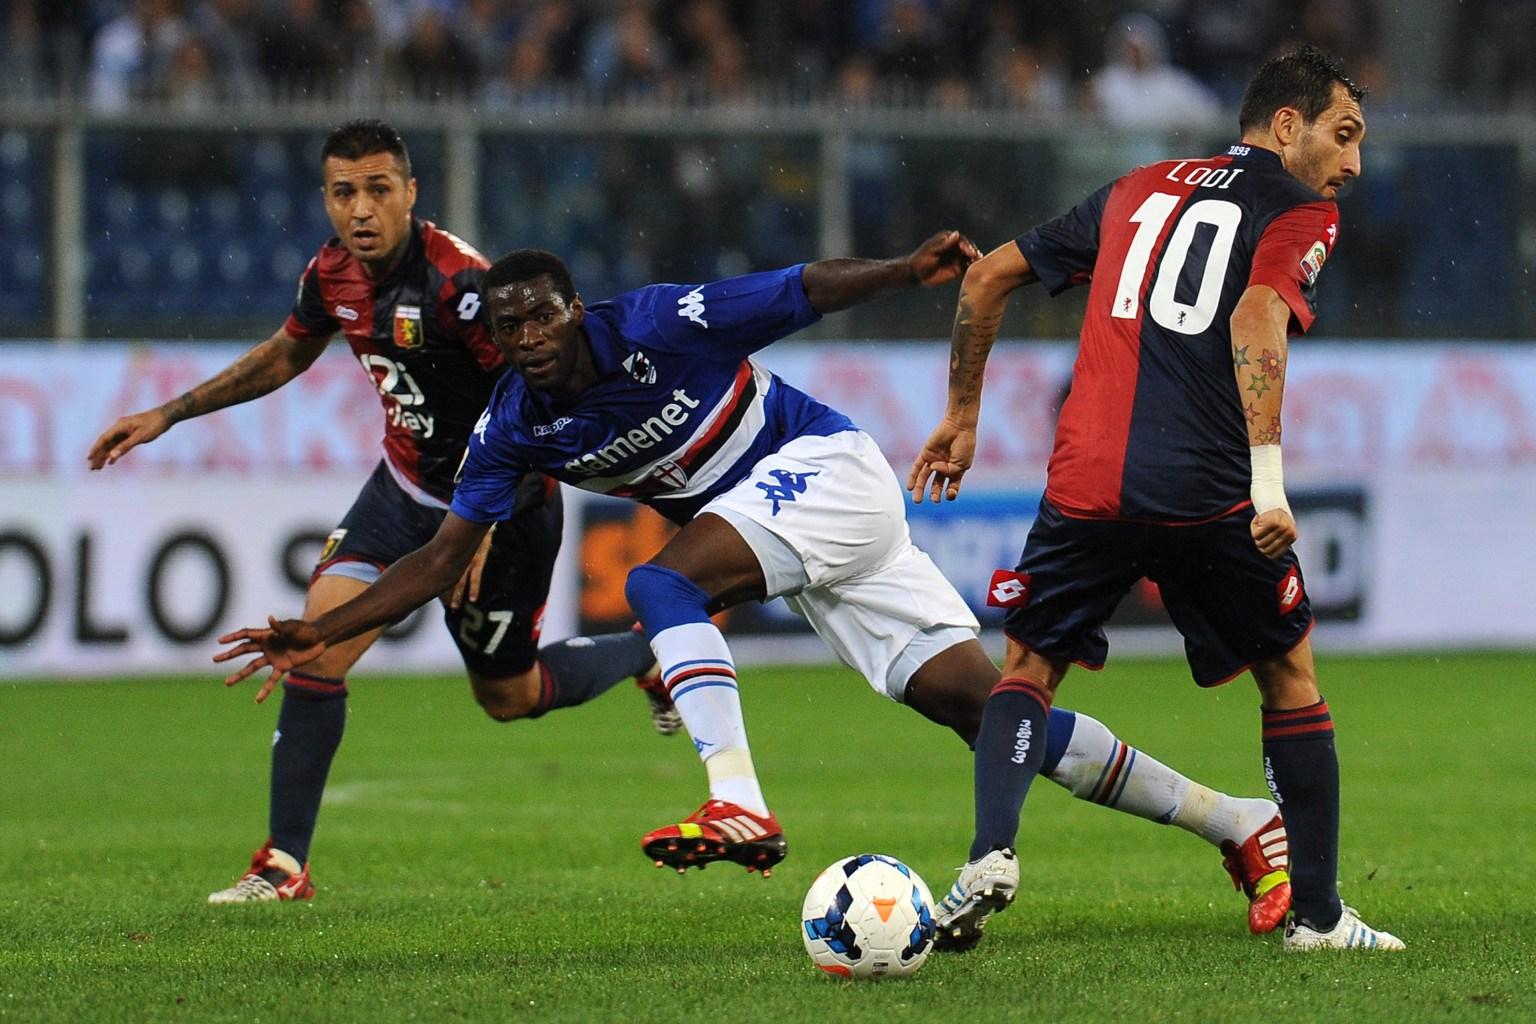 soi-keo-sampdoria-vs-genoa-luc-2h45-ngay-2-11-2020